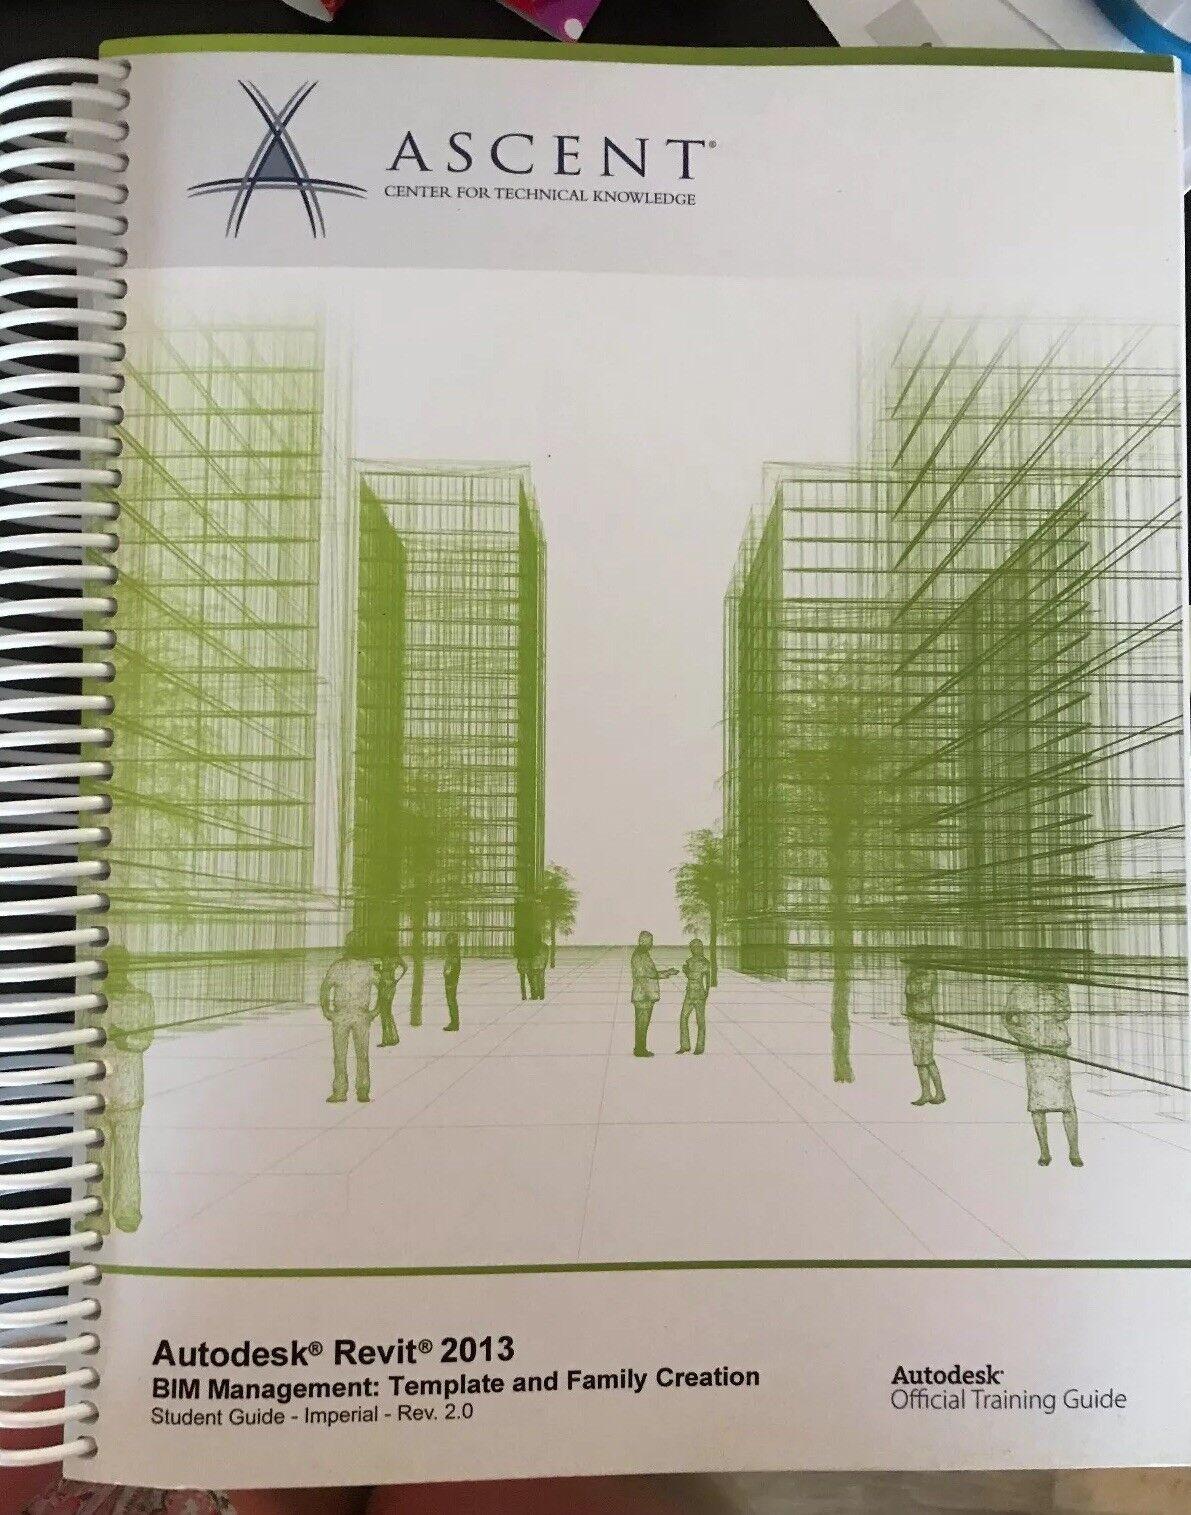 autodesk revit 2013 bim management template and family creation ebay rh ebay com Revit Training NJ Autodesk Revit Training